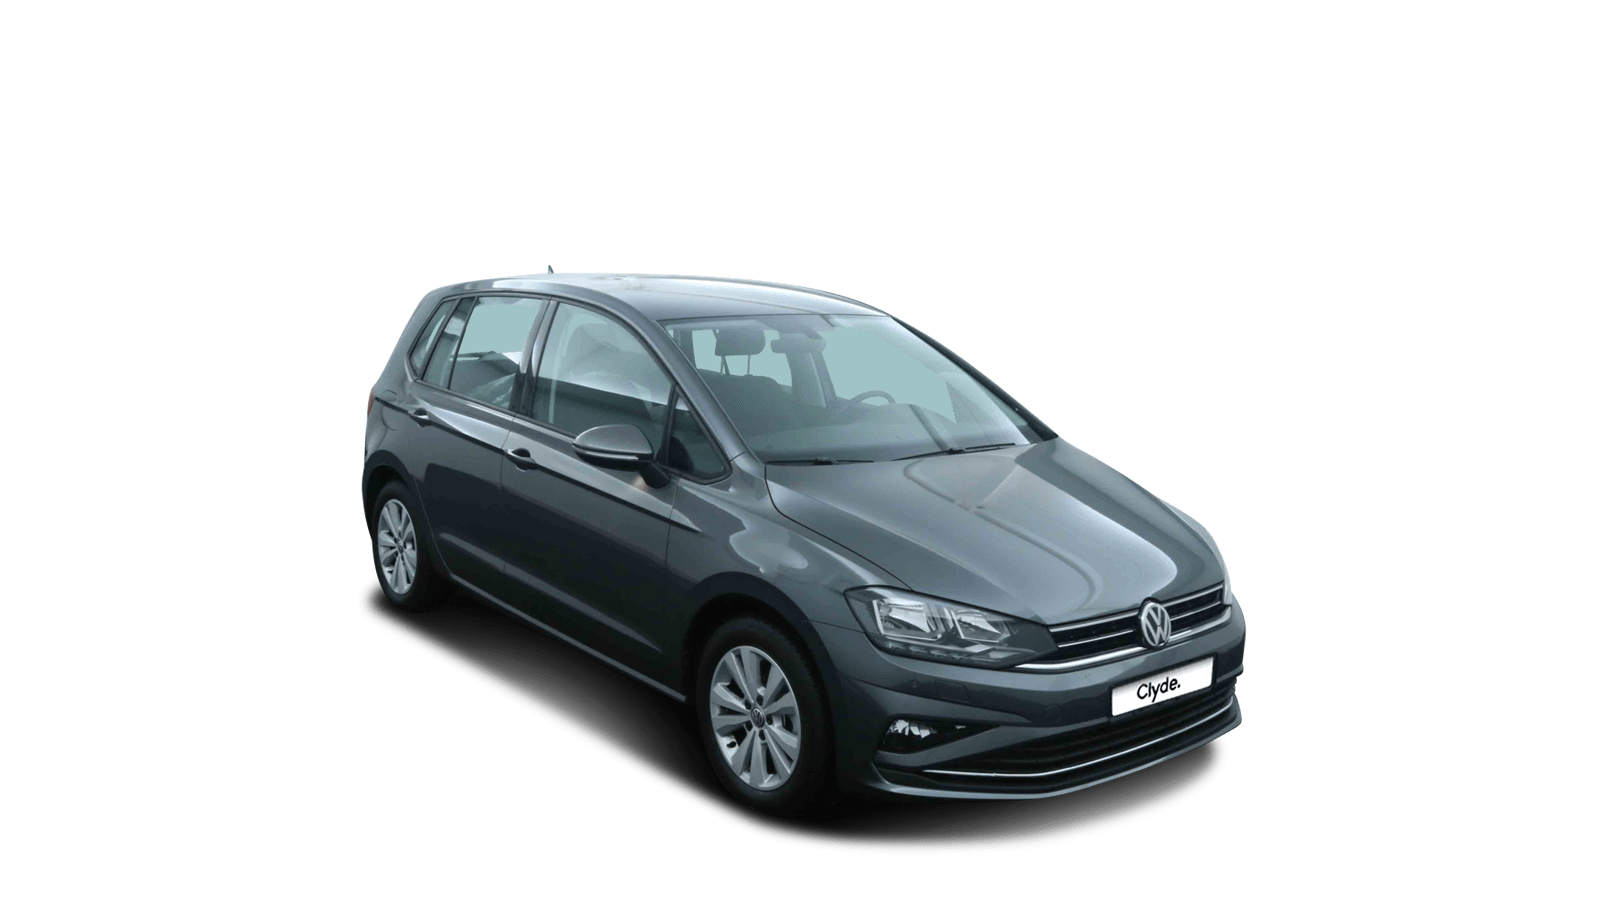 VW Golf Sportsvan Grey front - Clyde car subscription